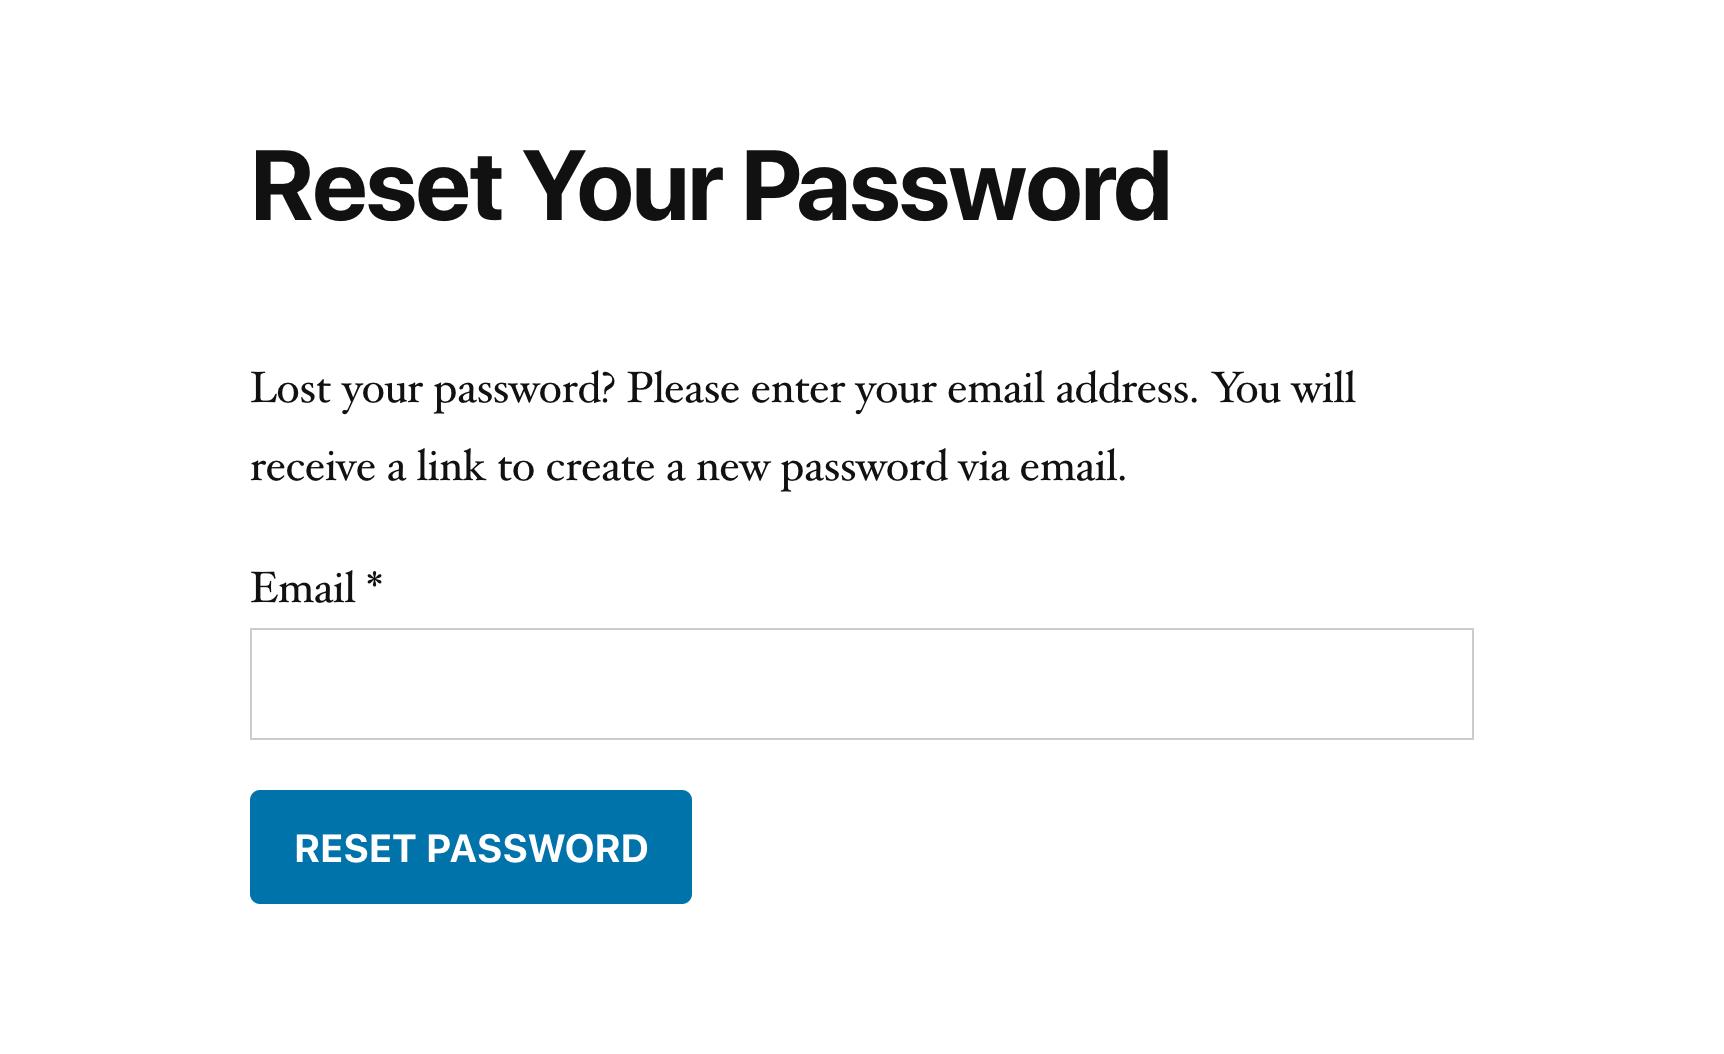 SliceWP lost password form.